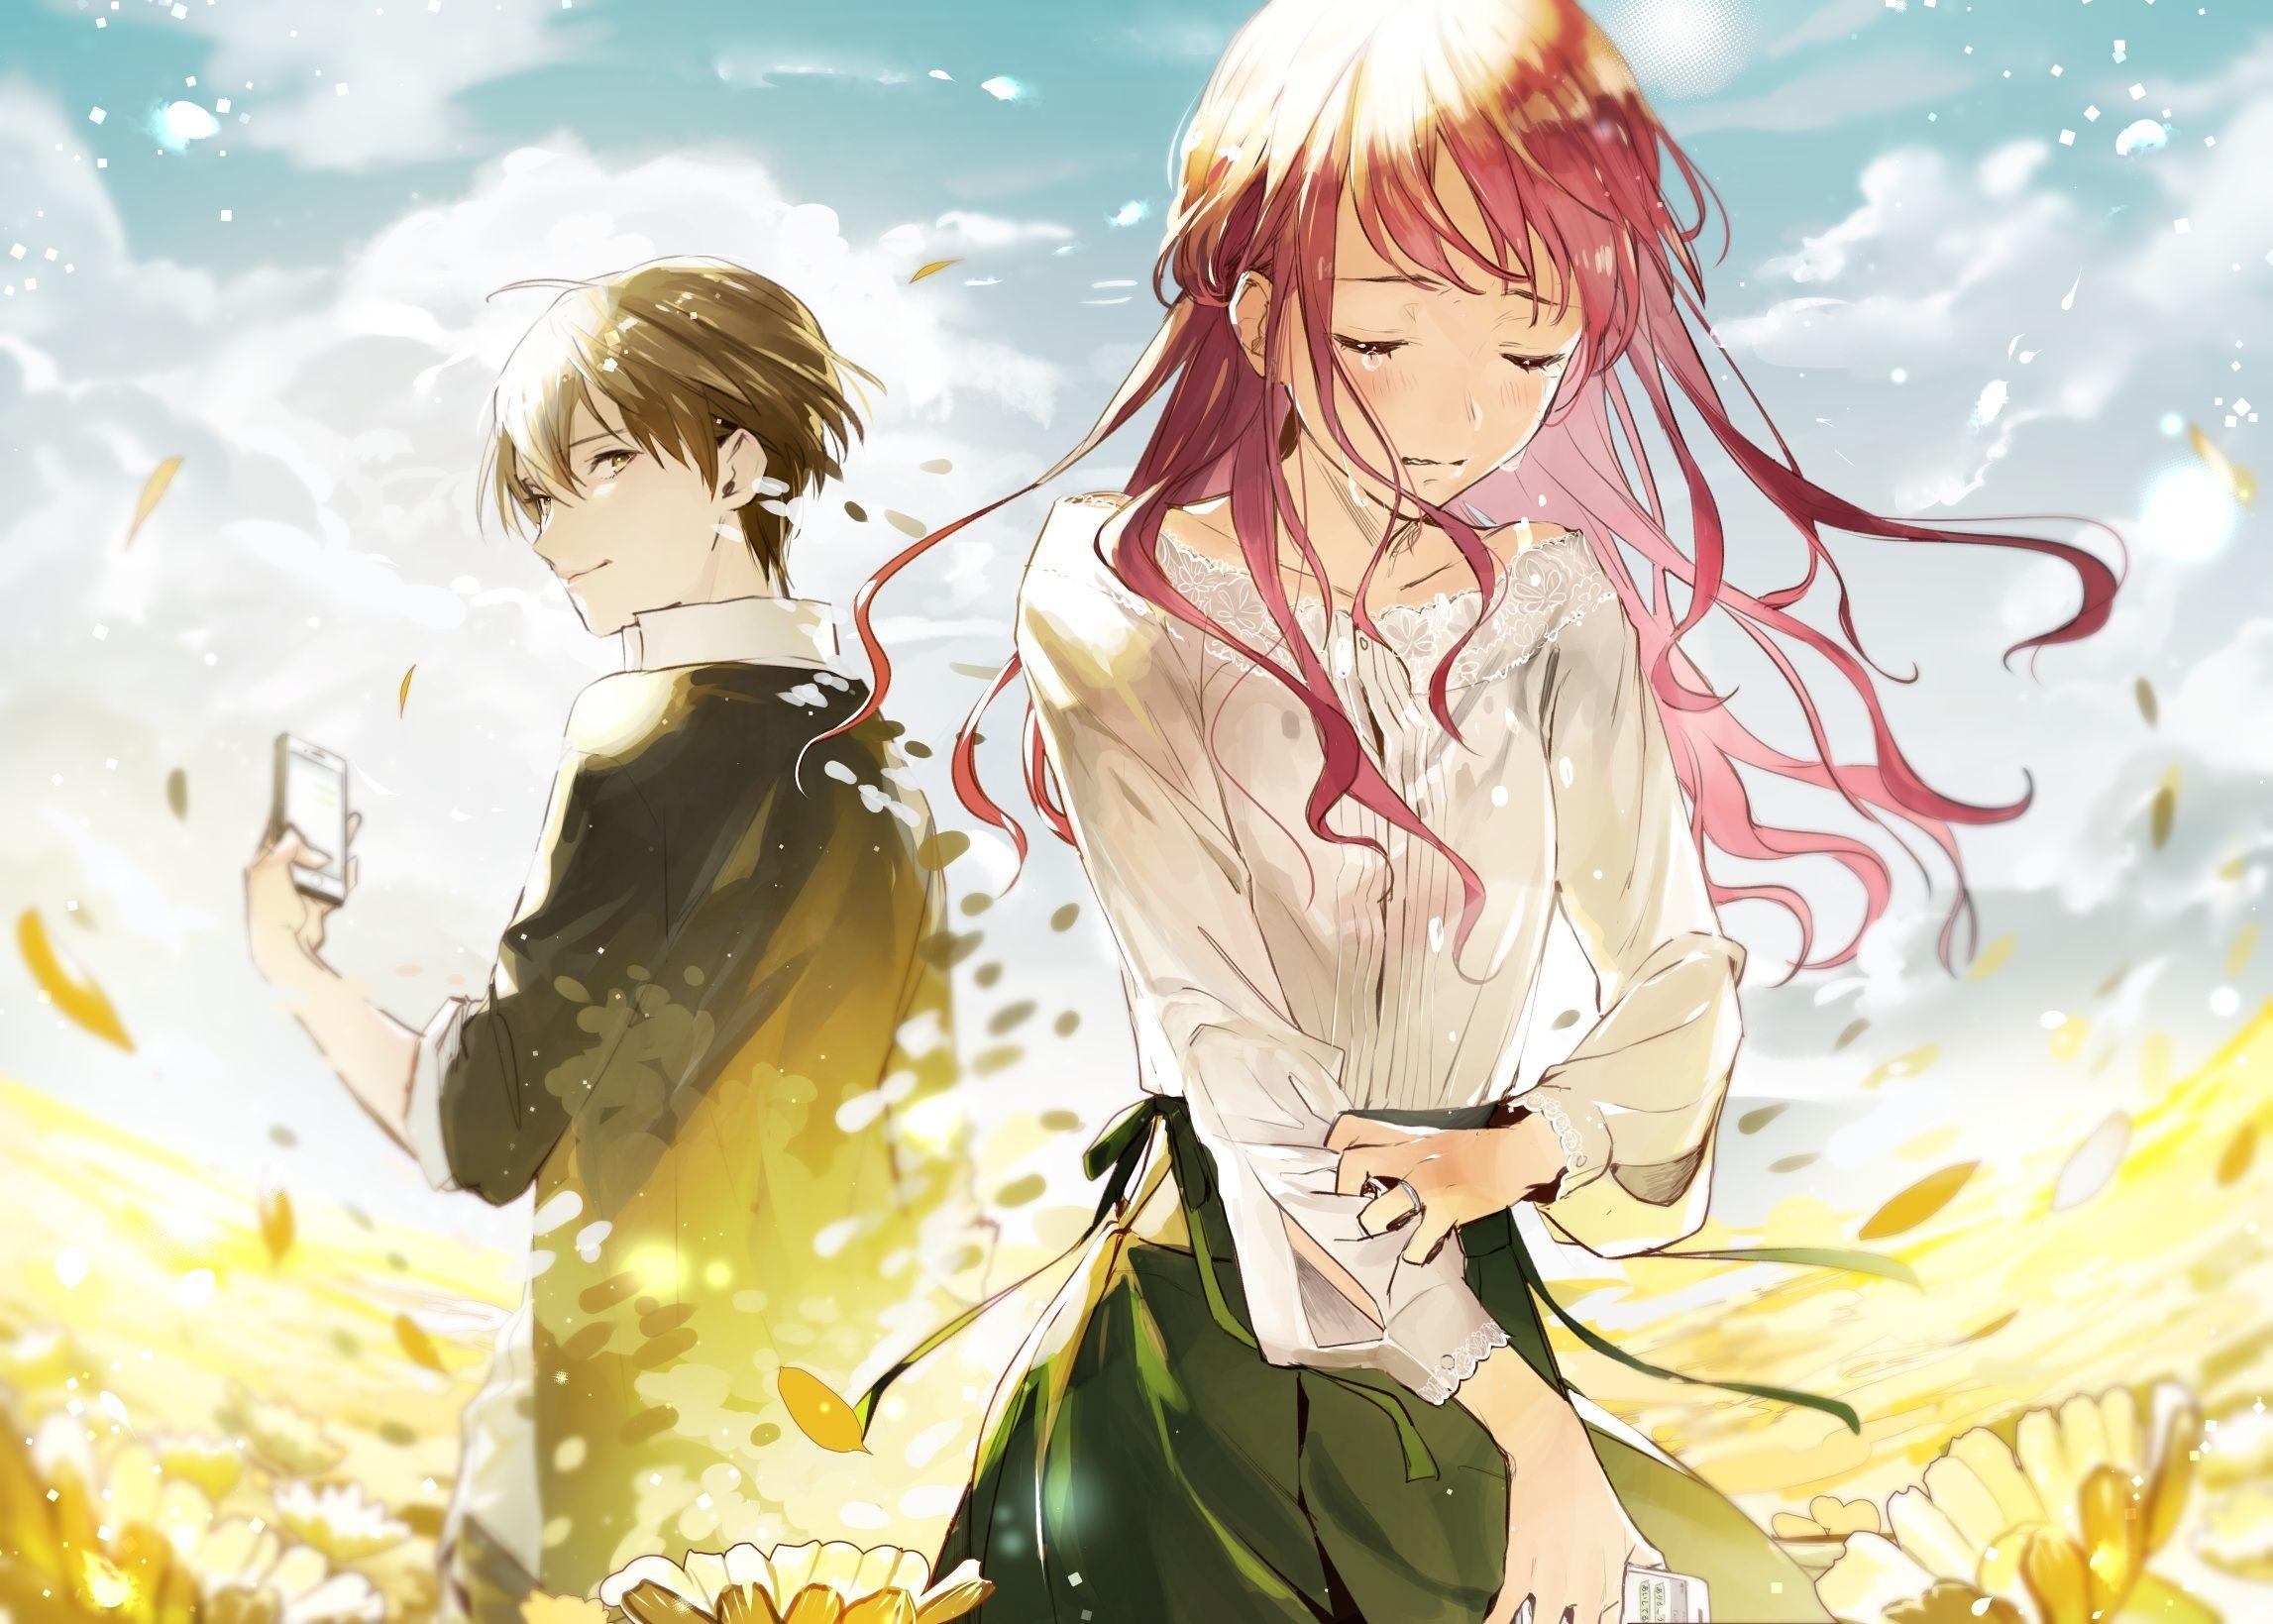 Ghim trên Anime*Manga*Manhwa*Nhân vật game